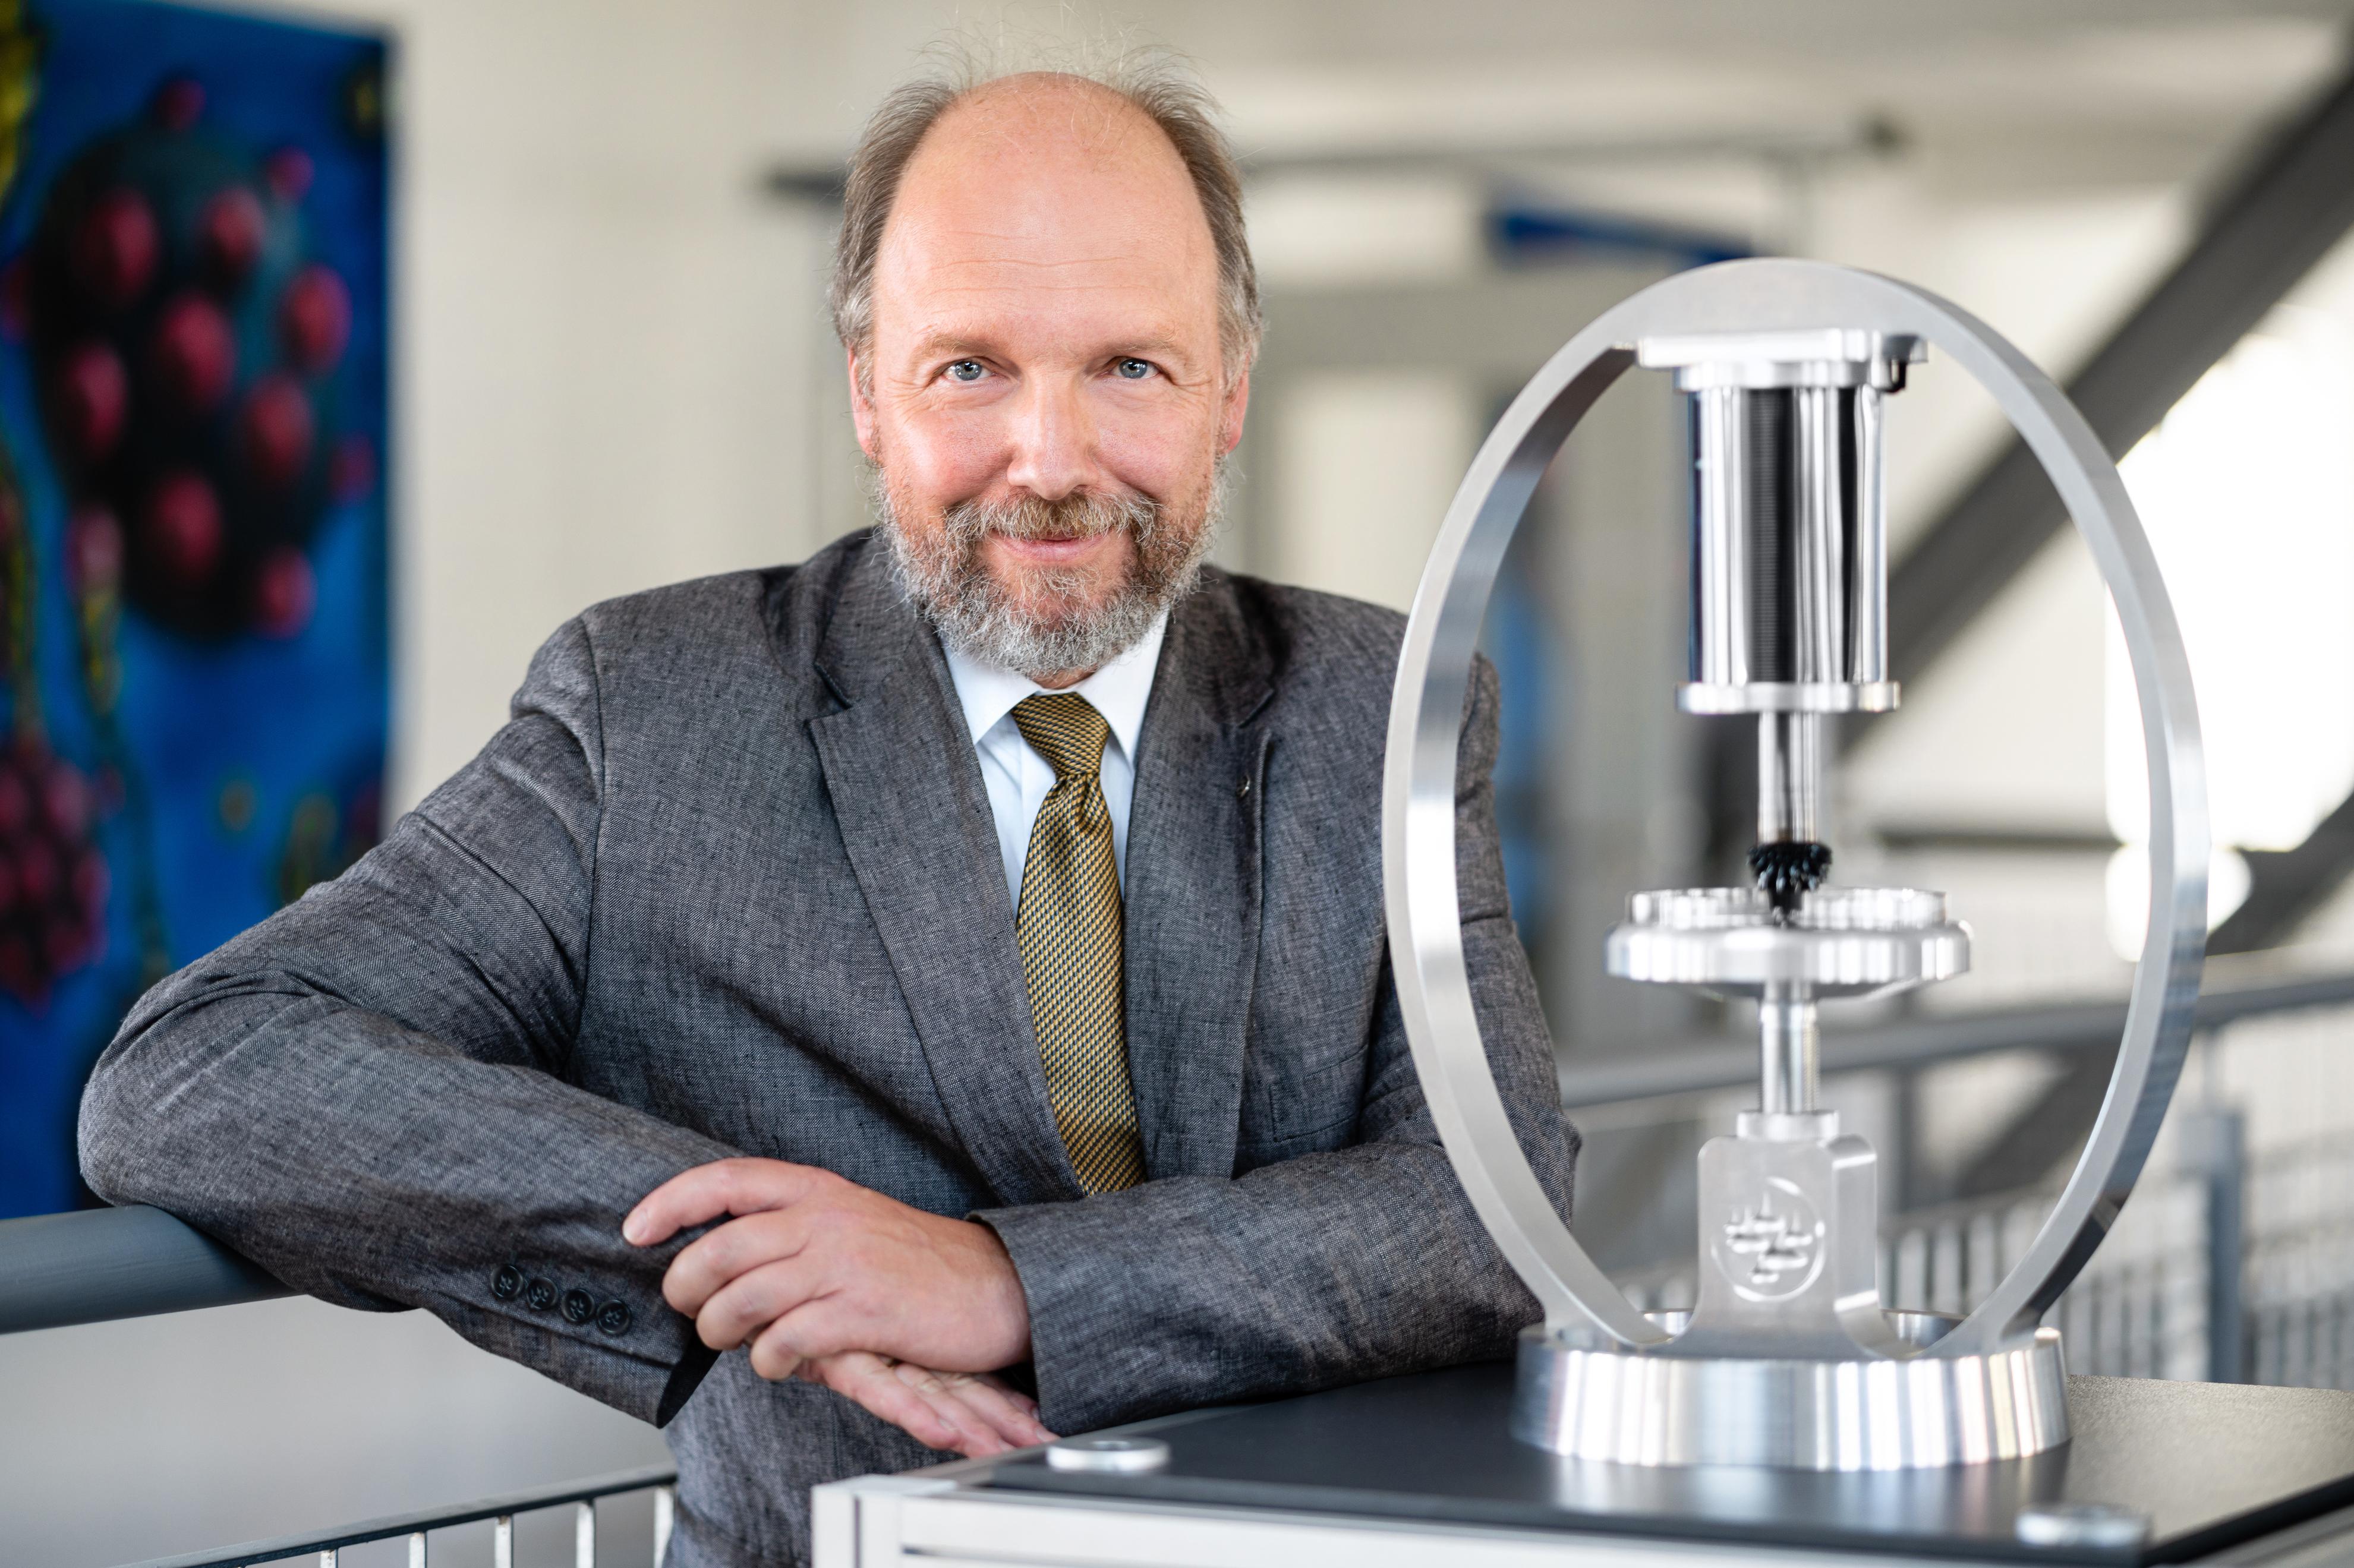 Prof. Dr. rer. nat. habil. Stefan Odenbach